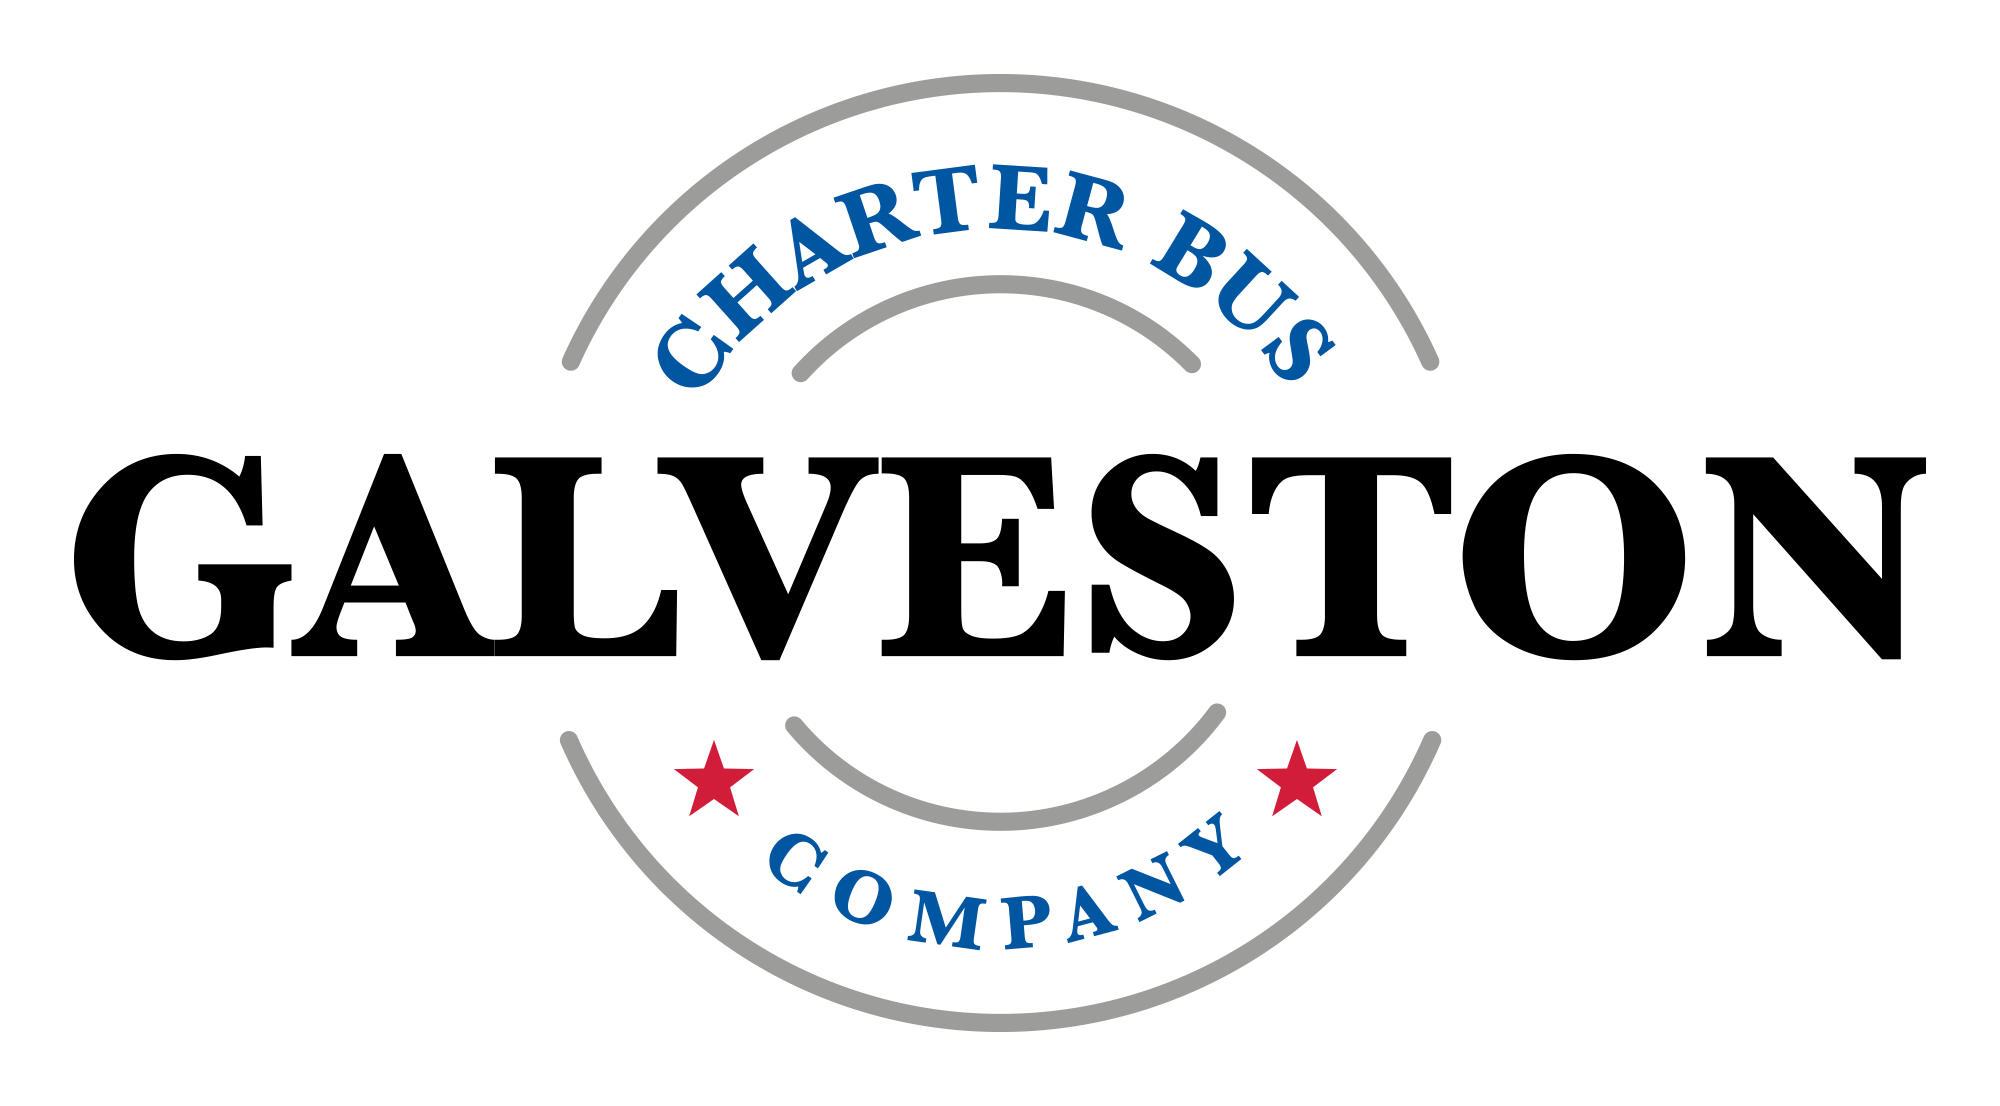 Galveston charter bus